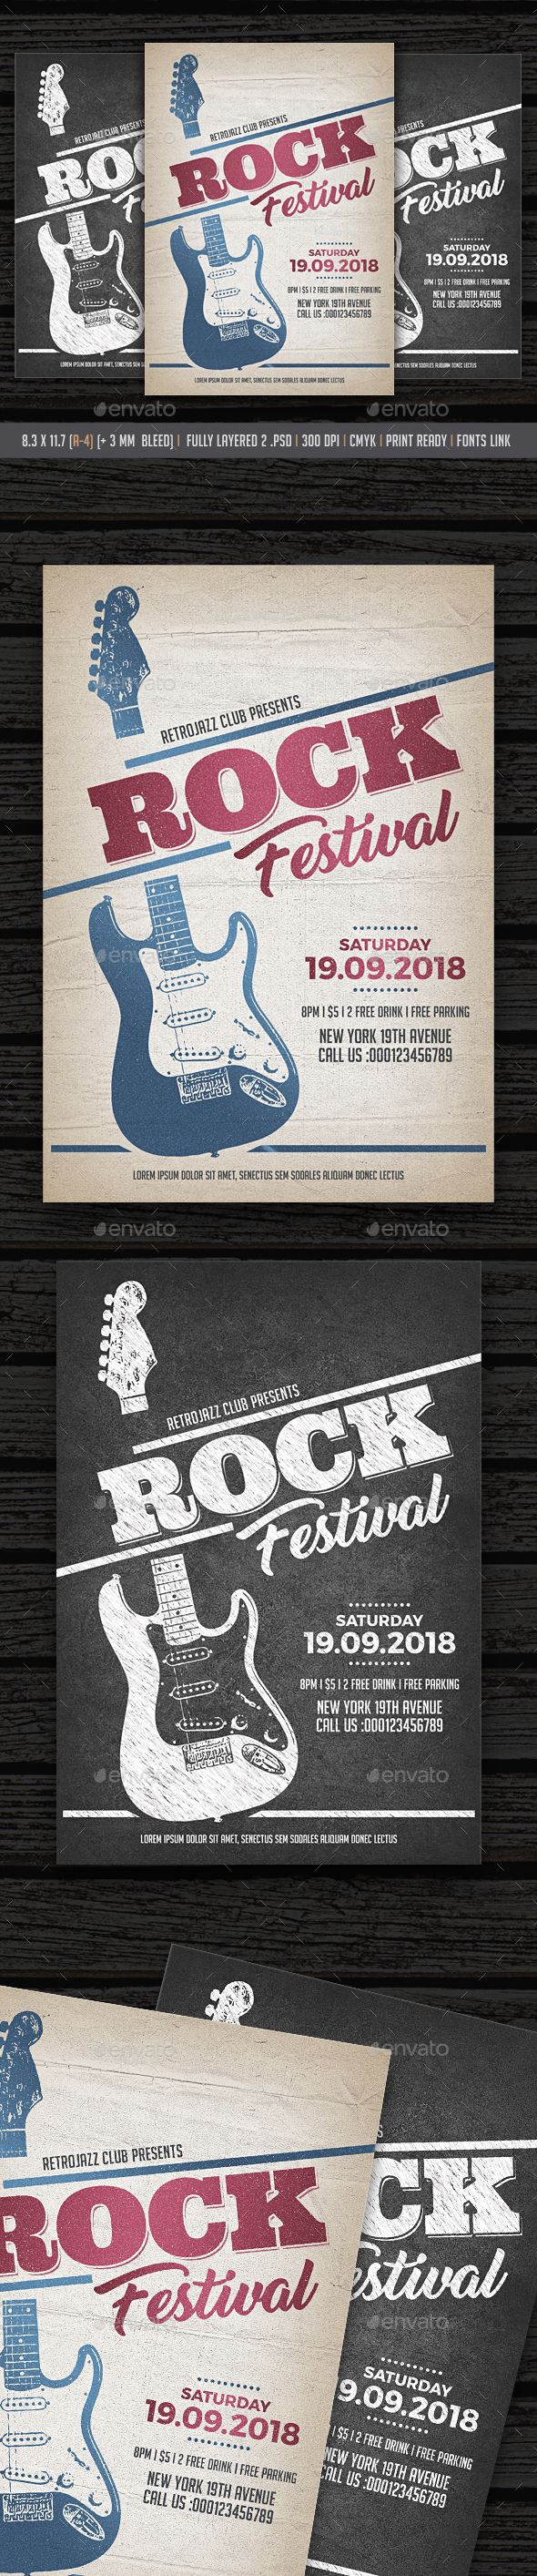 Rock Festival / Rock Festival Flyer Flyer Template PSD, Vector EPS